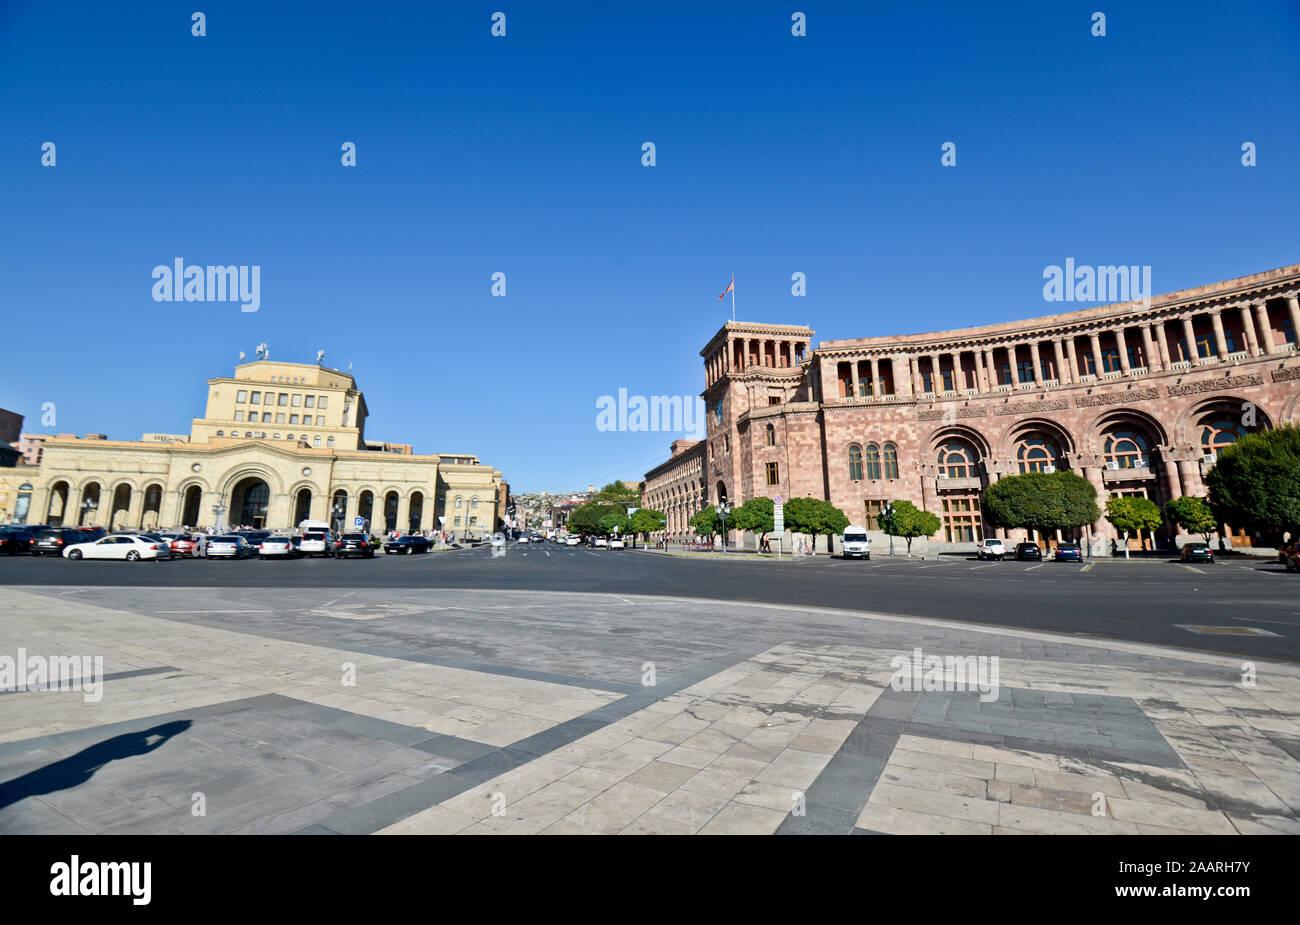 Yerevan, Republic Square: Government House of Armenia and History Museum of Armenia / National Gallery of Armenia Stock Photo